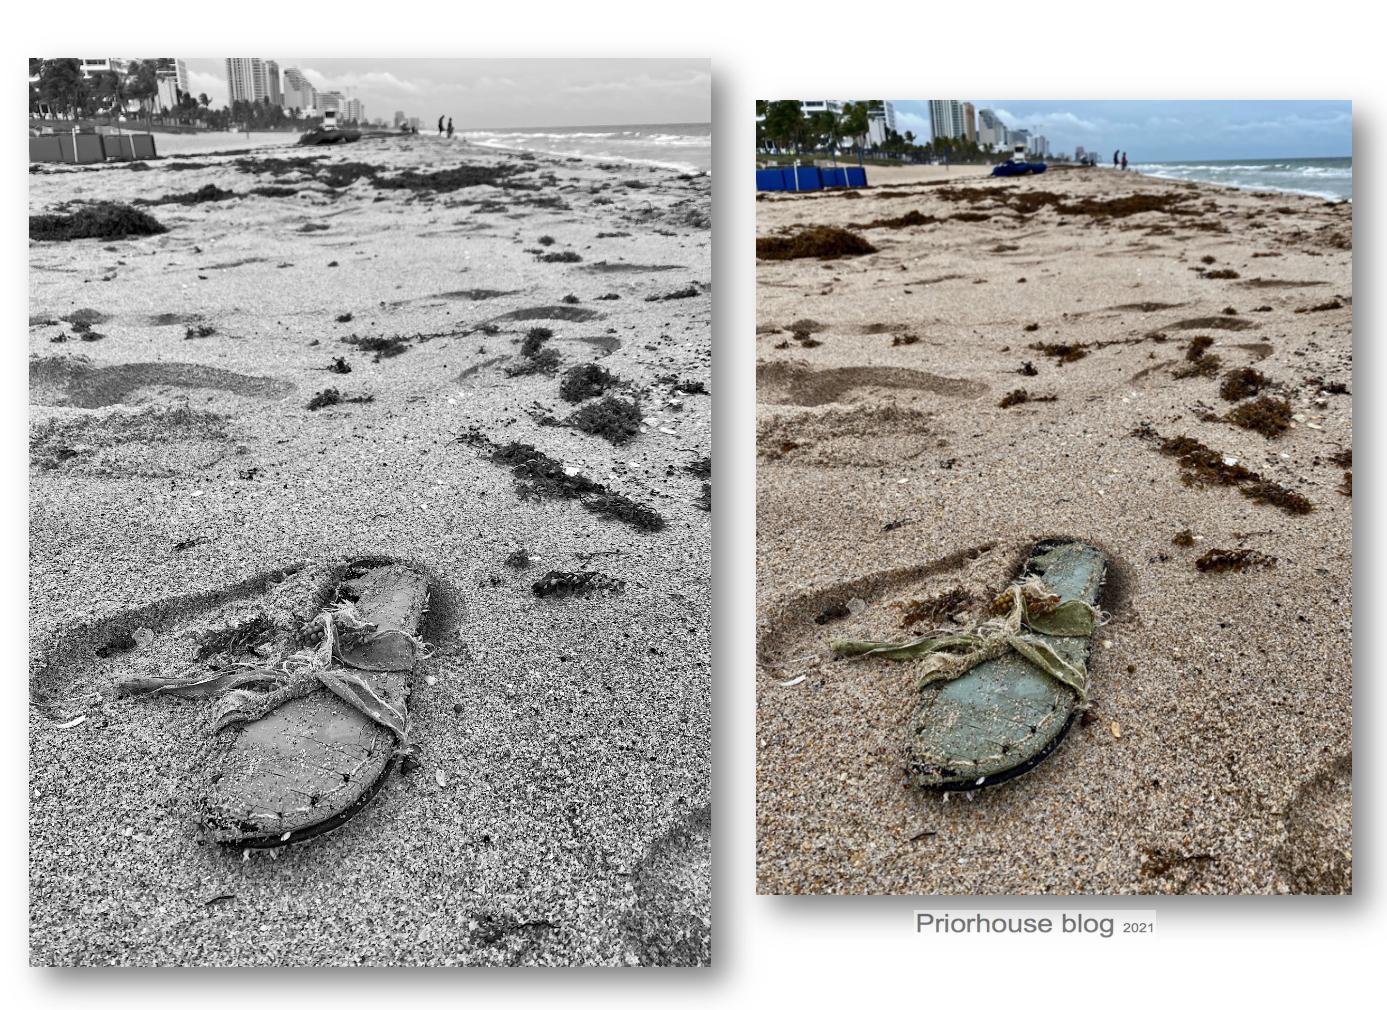 lens-same pic- shoe on beach